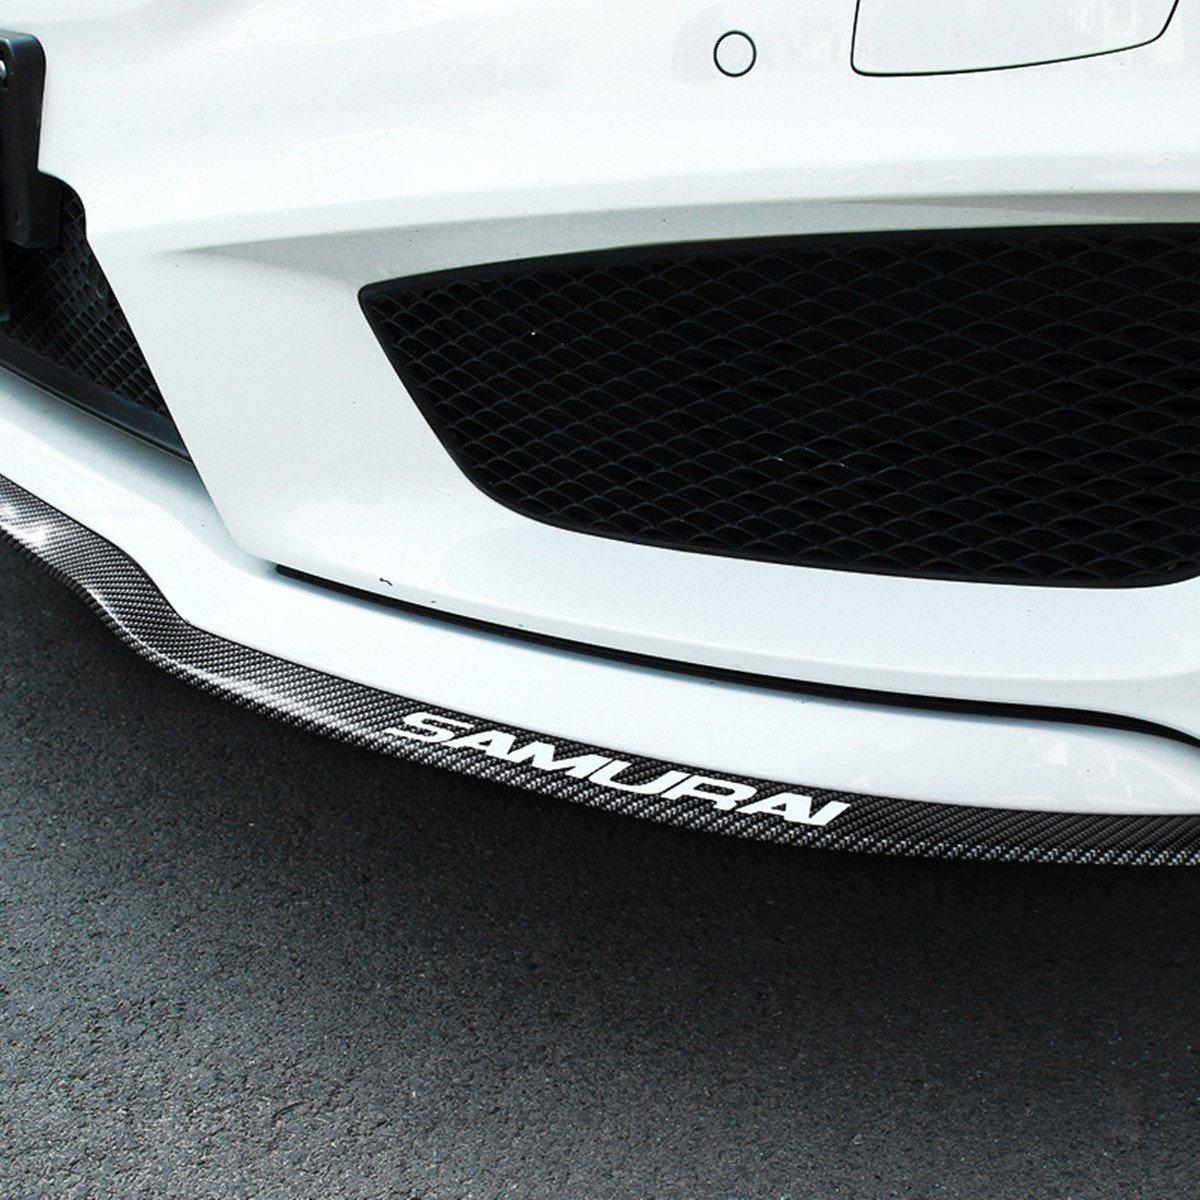 COOL·CAR Car Universal Lip Kit Front carbon fibe Soft rubber Bumper Chin Spoiler Splitter Side Skirt Roof Spoiler(2.5 meters,carbon fiber)